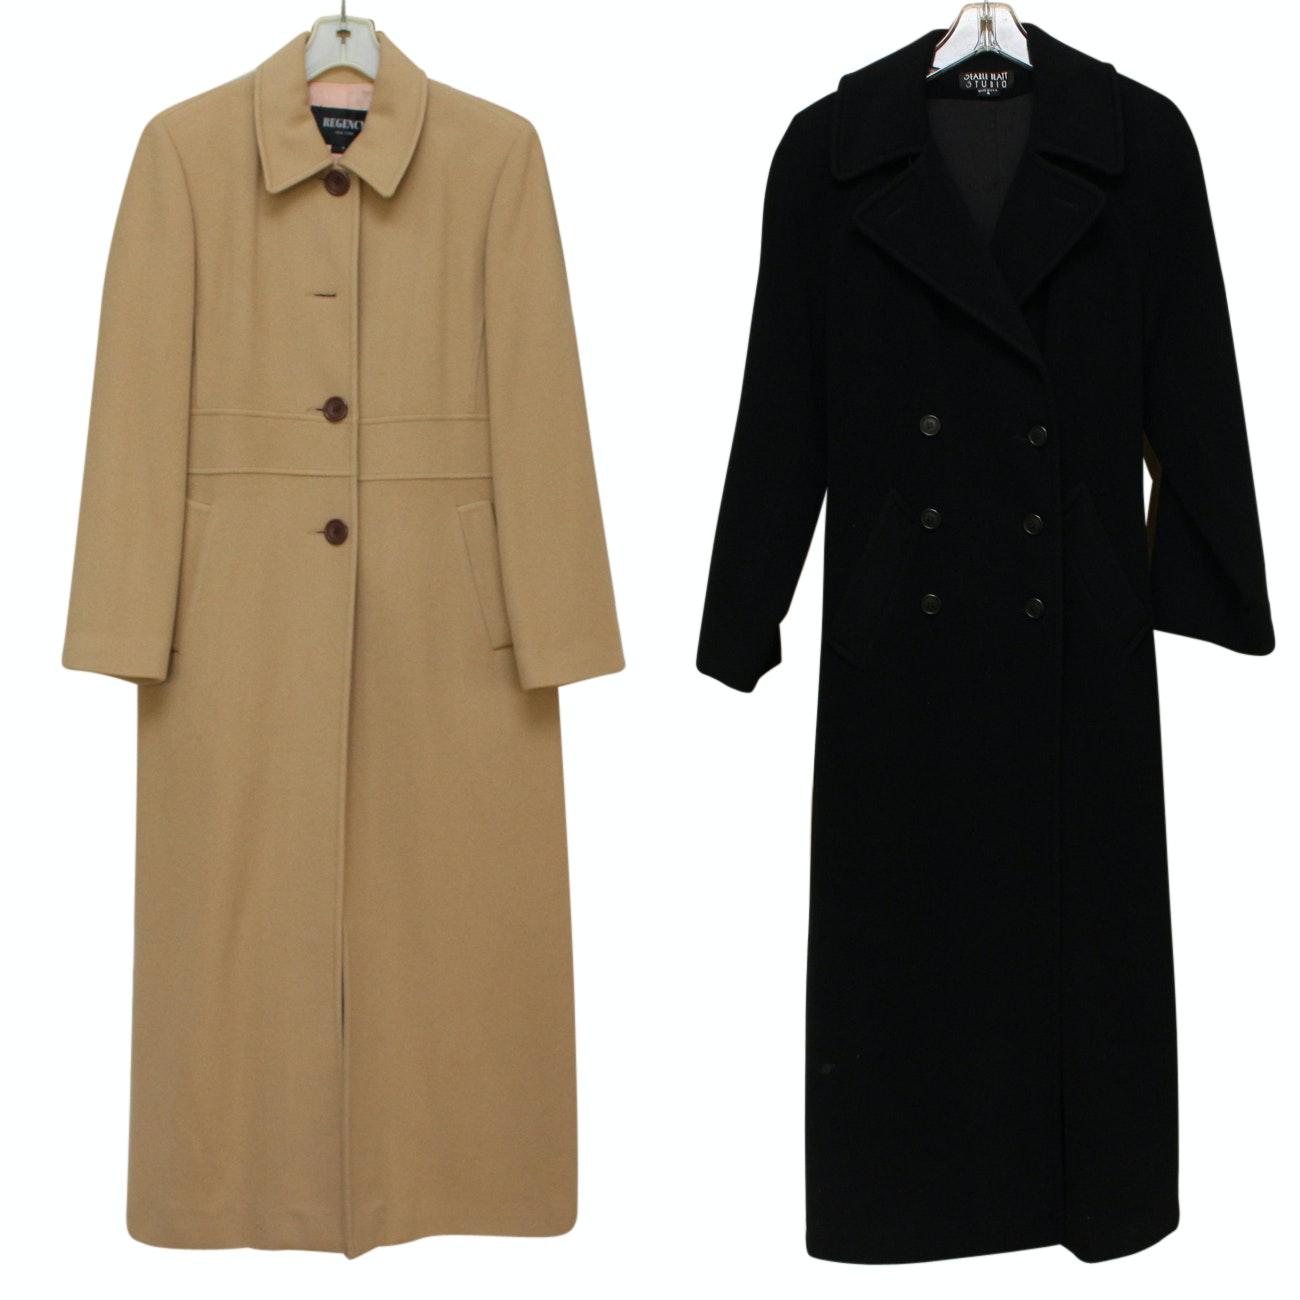 Searle Blatt Studio and Regency New York Cashmere Trench Coats